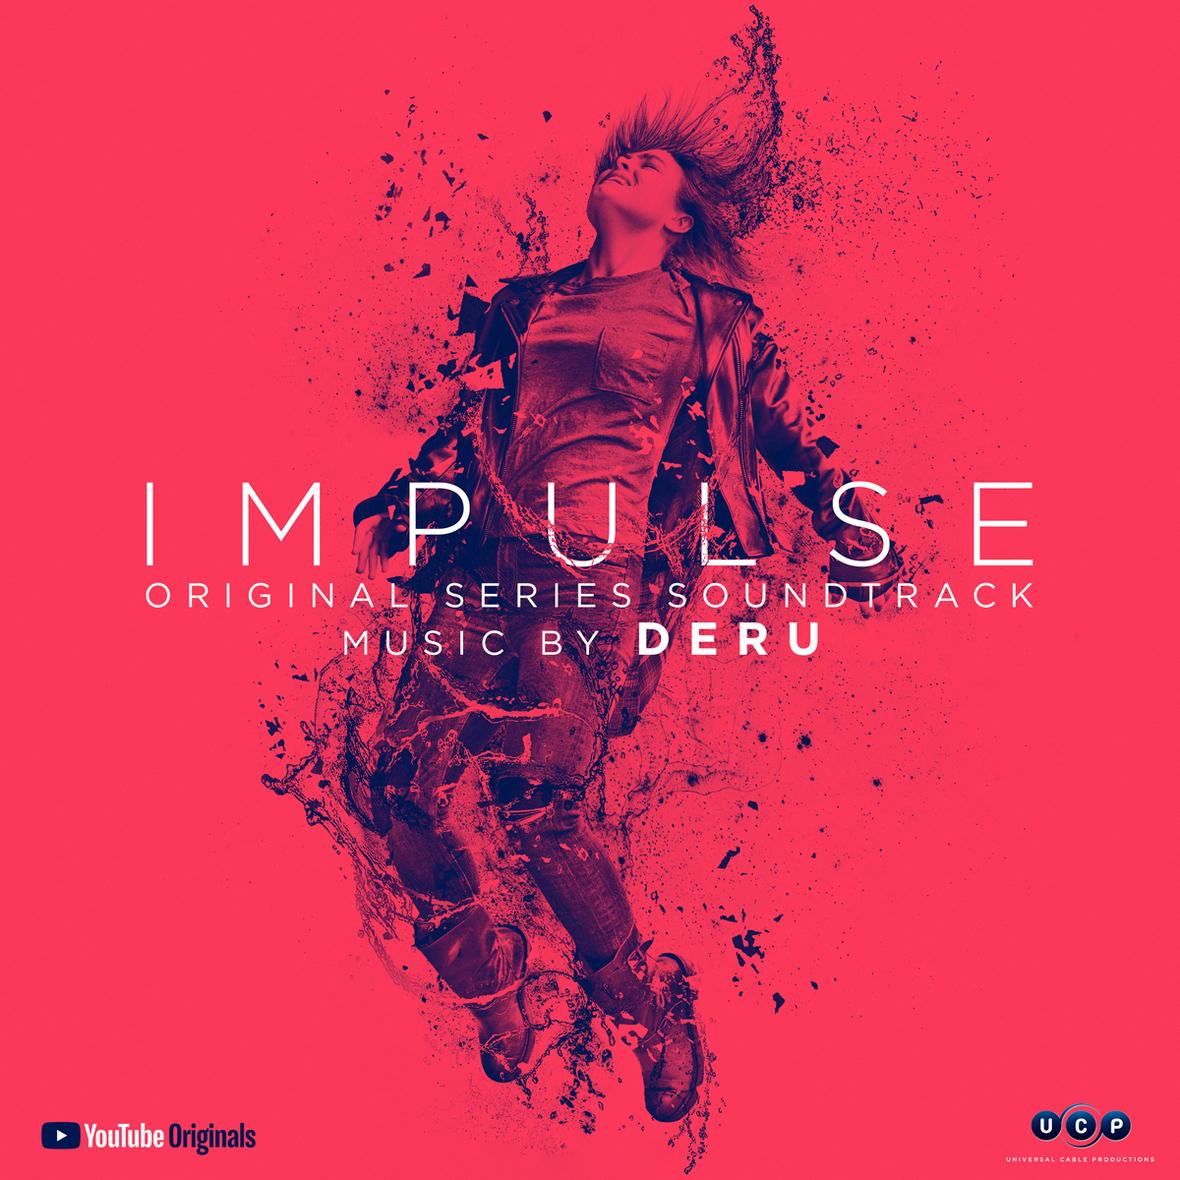 impulse 1200